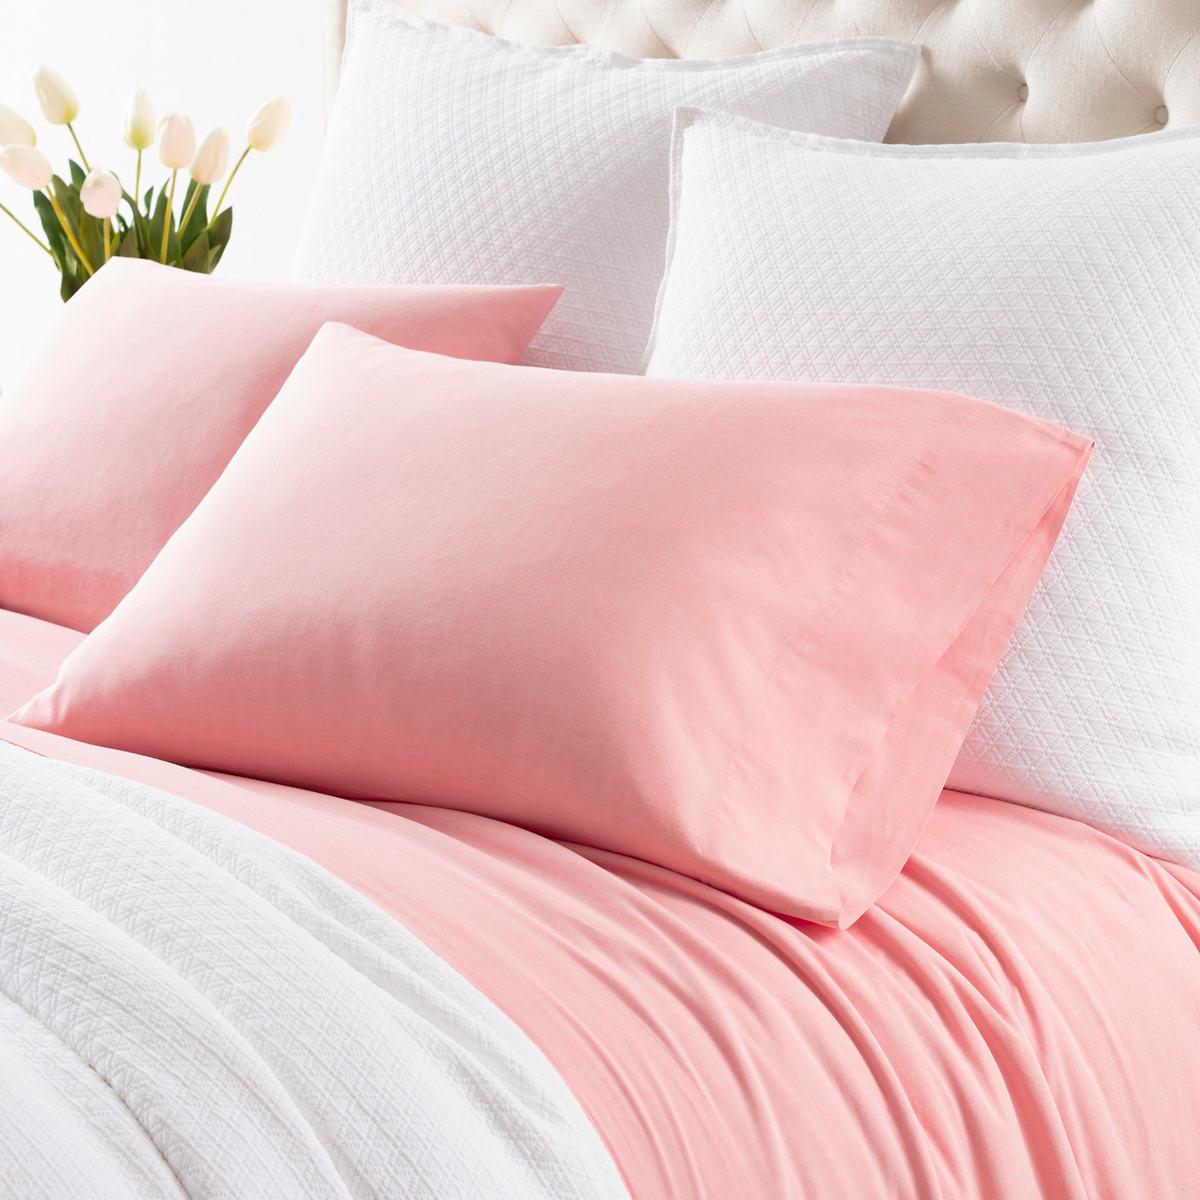 Comfy Cotton Coral Pillowcases